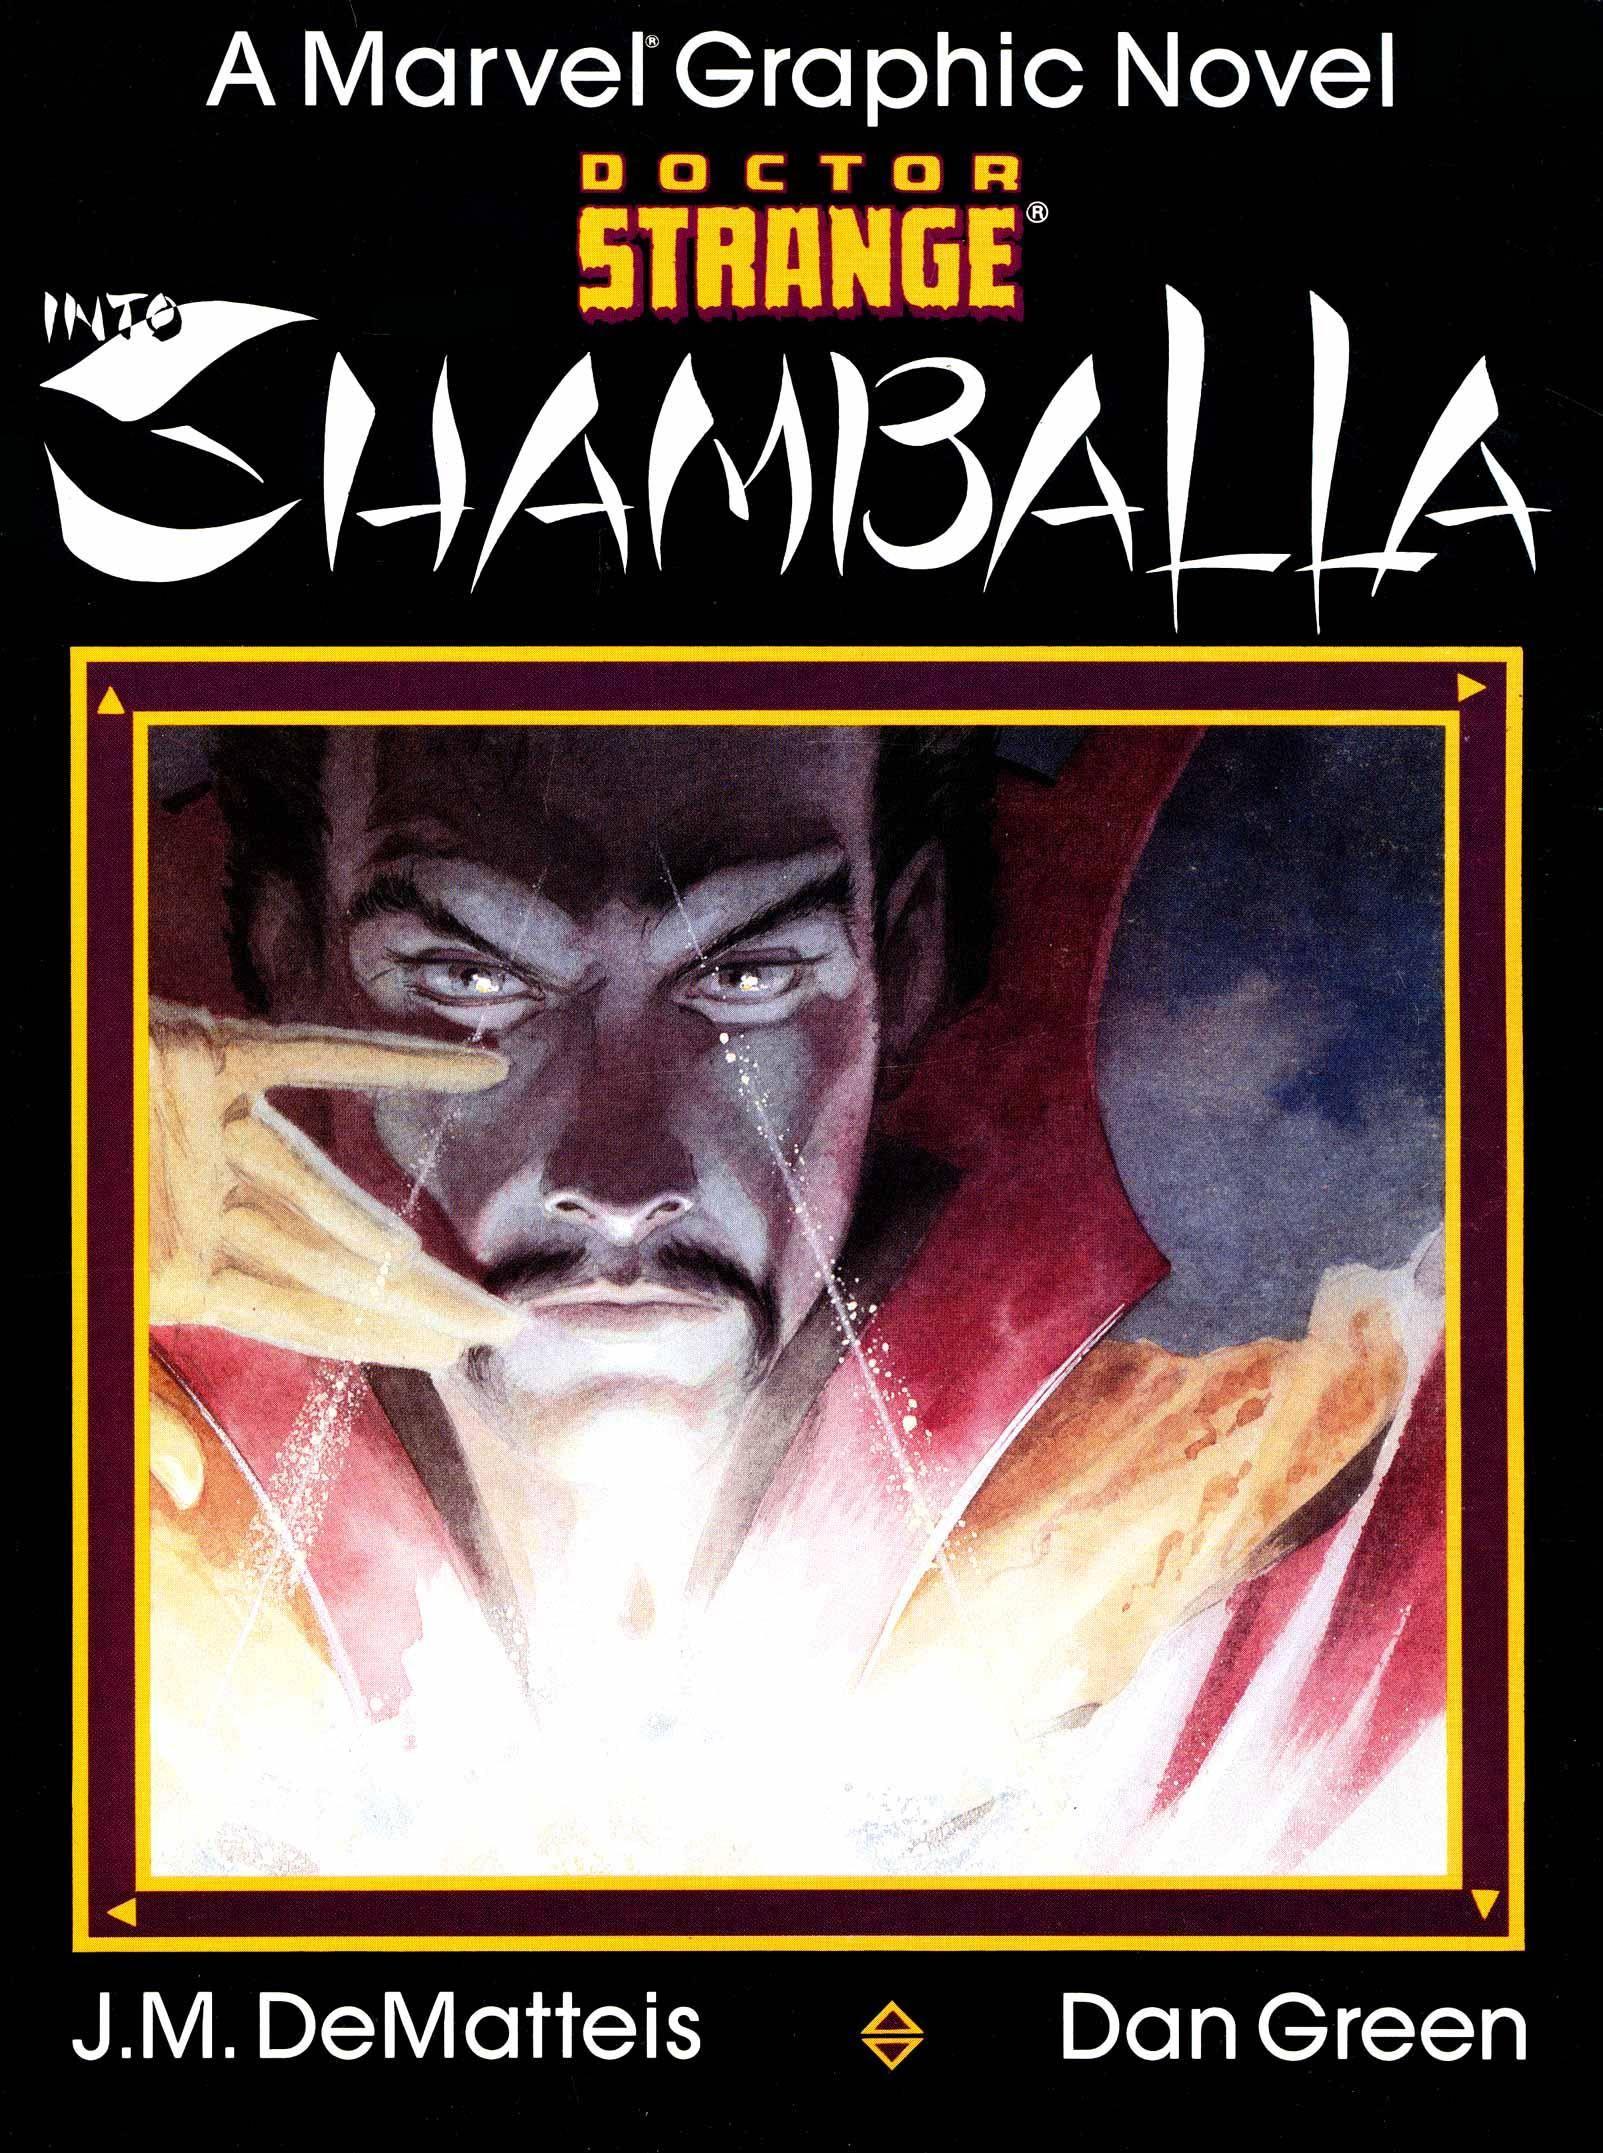 Marvel Graphic Novel 23 - Dr Strange - Into Shamballa